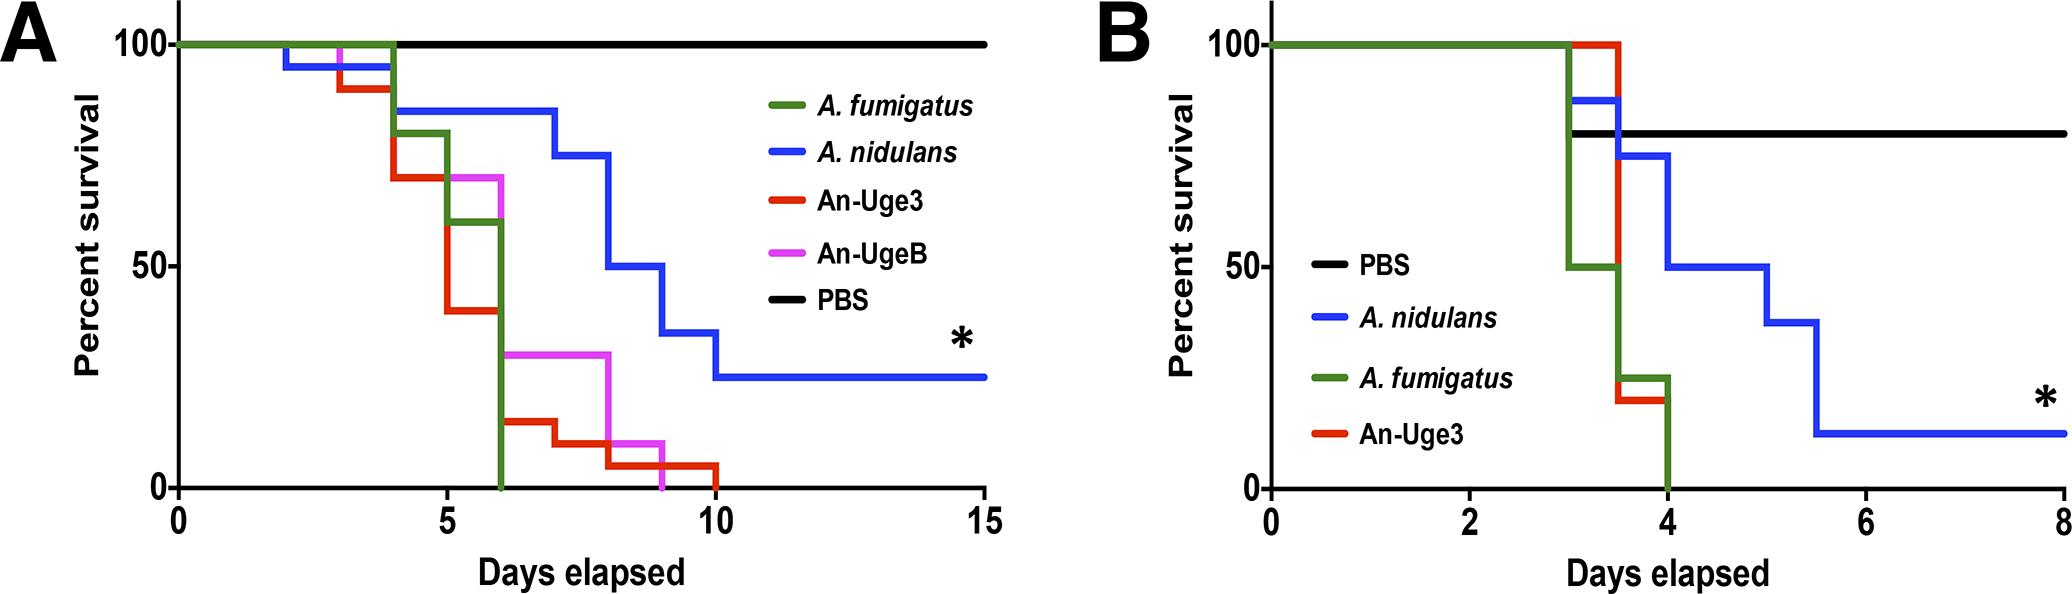 Overexpression of <i>uge3</i> in <i>A</i>. <i>nidulans</i> increases virulence in mice.